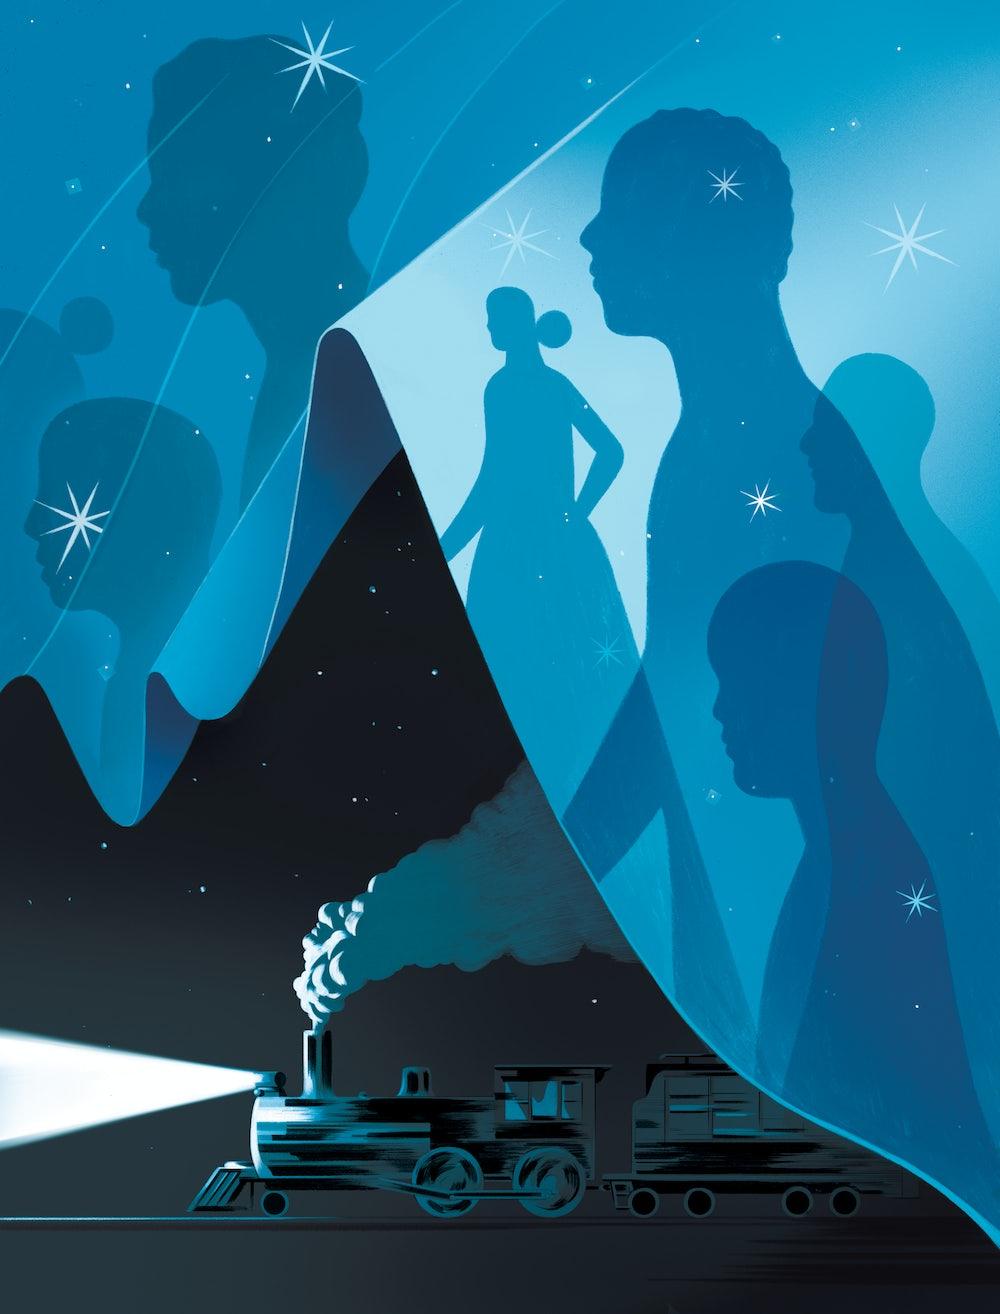 colson whitehead s fantastic voyage new republic illustrations by rebekka dunlap